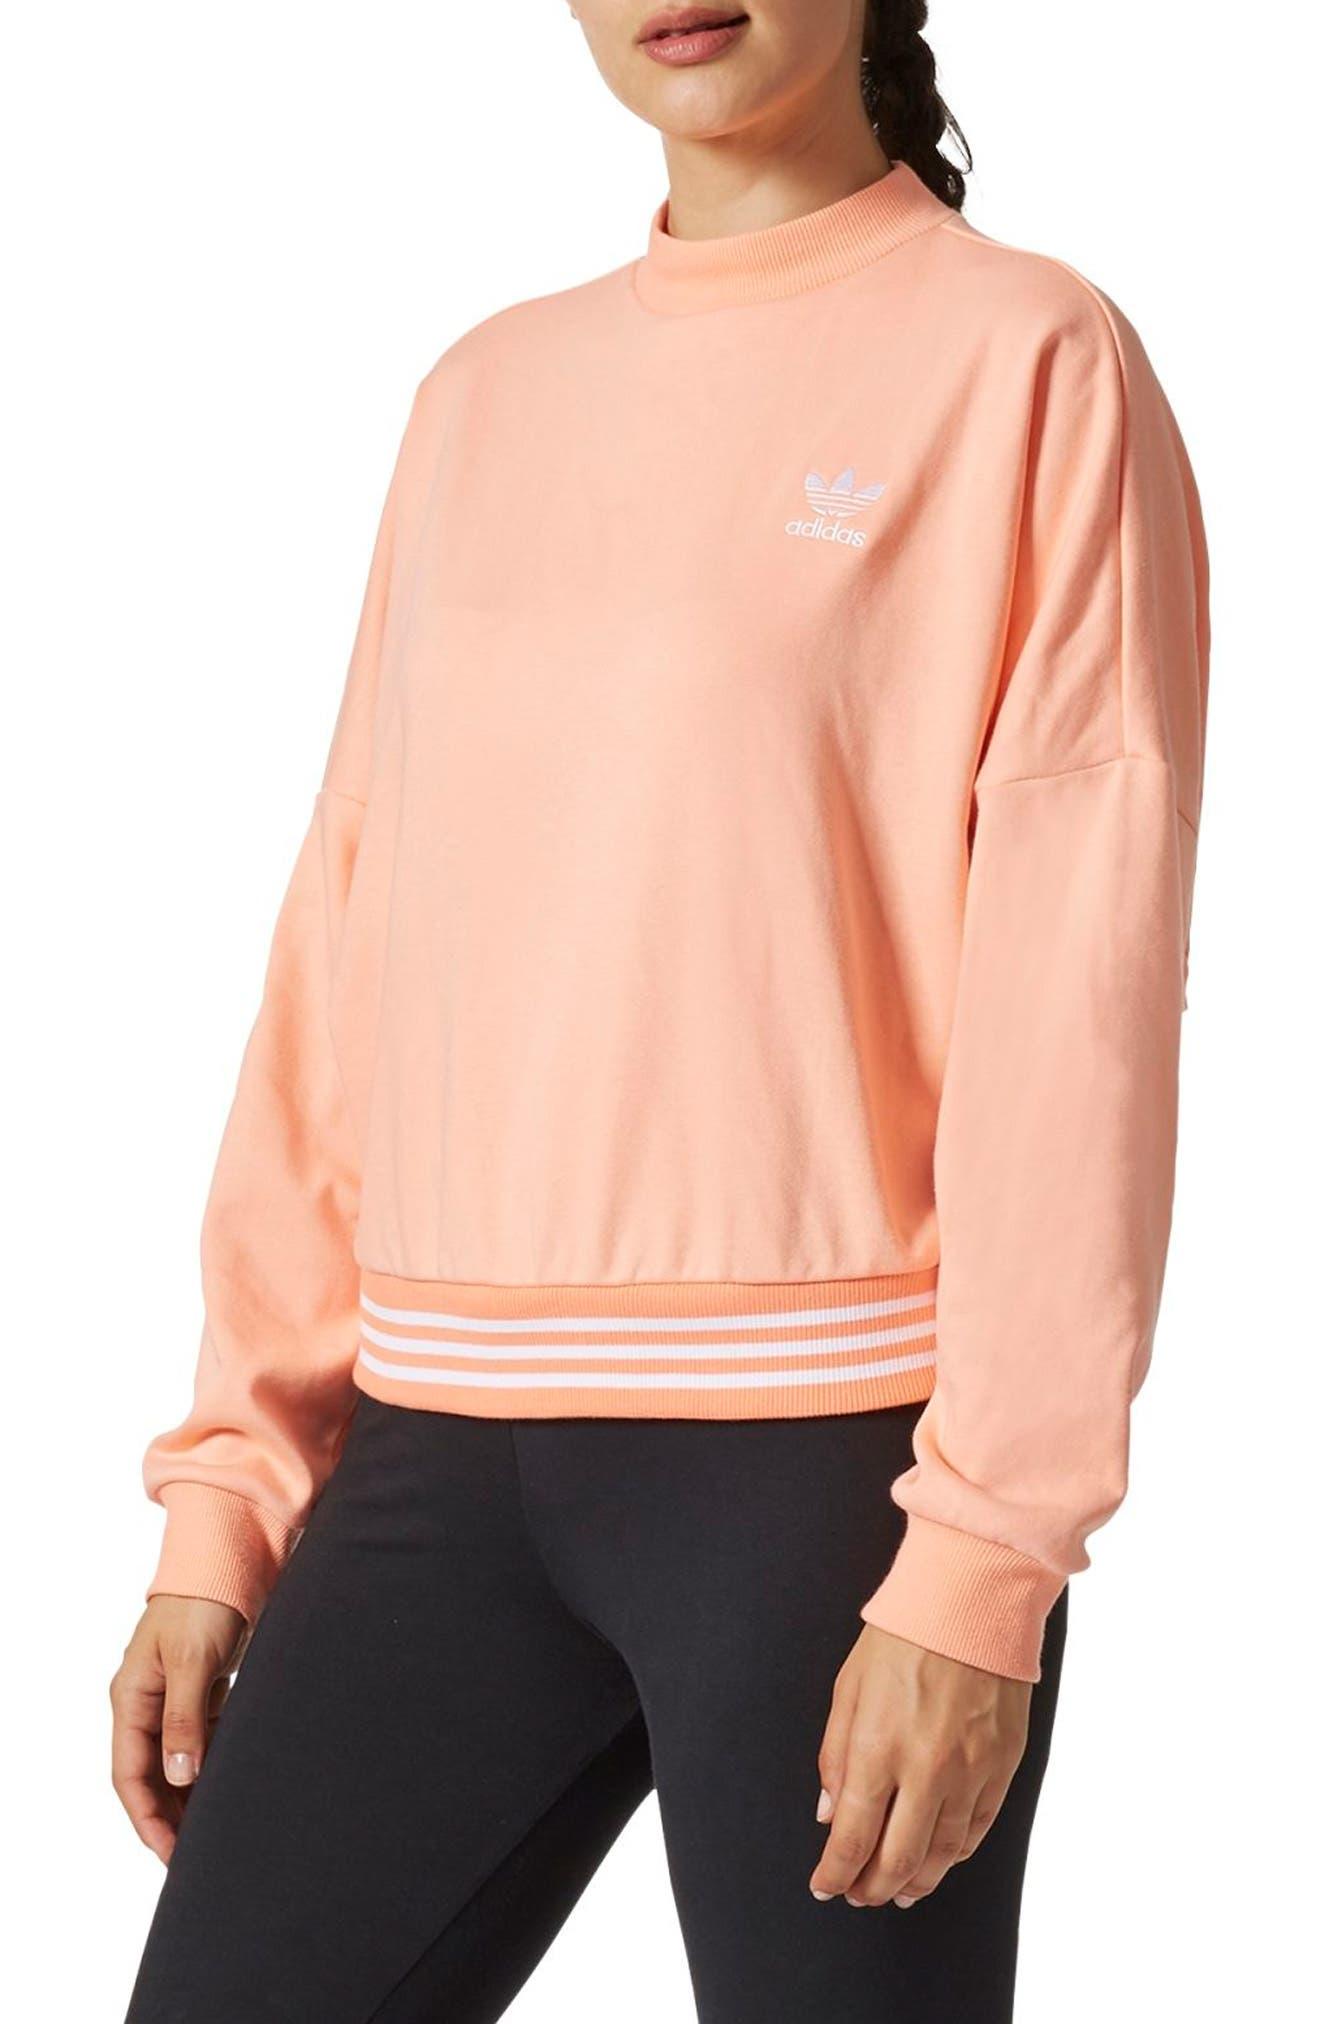 Main Image - adidas Originals by Pharrell Williams HU Sweater